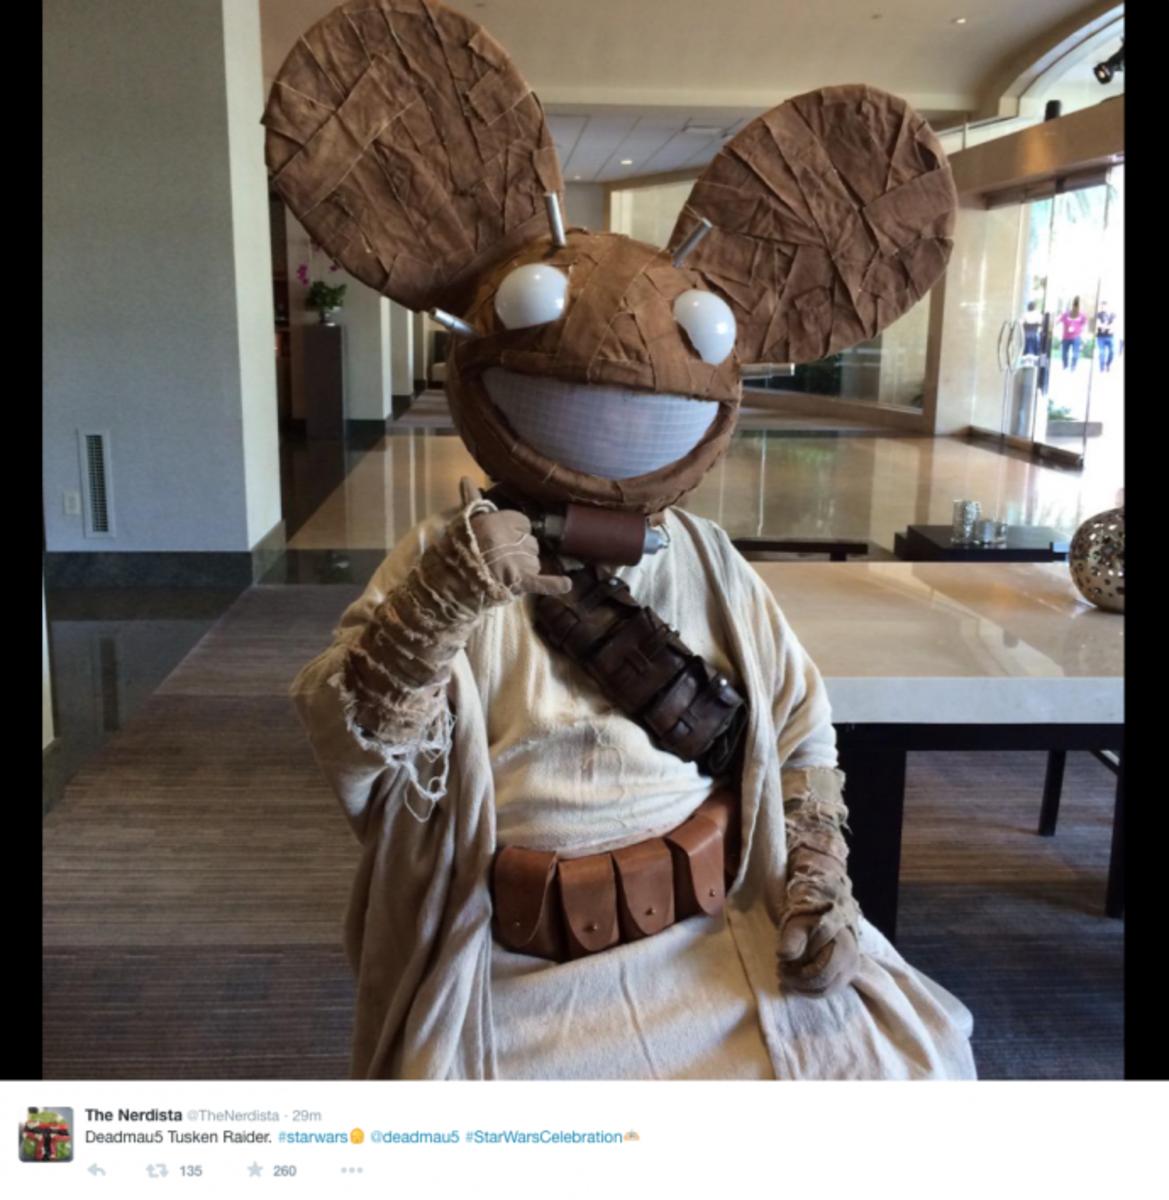 deadmau5 Makes It Into Star Wars (Kind Of)